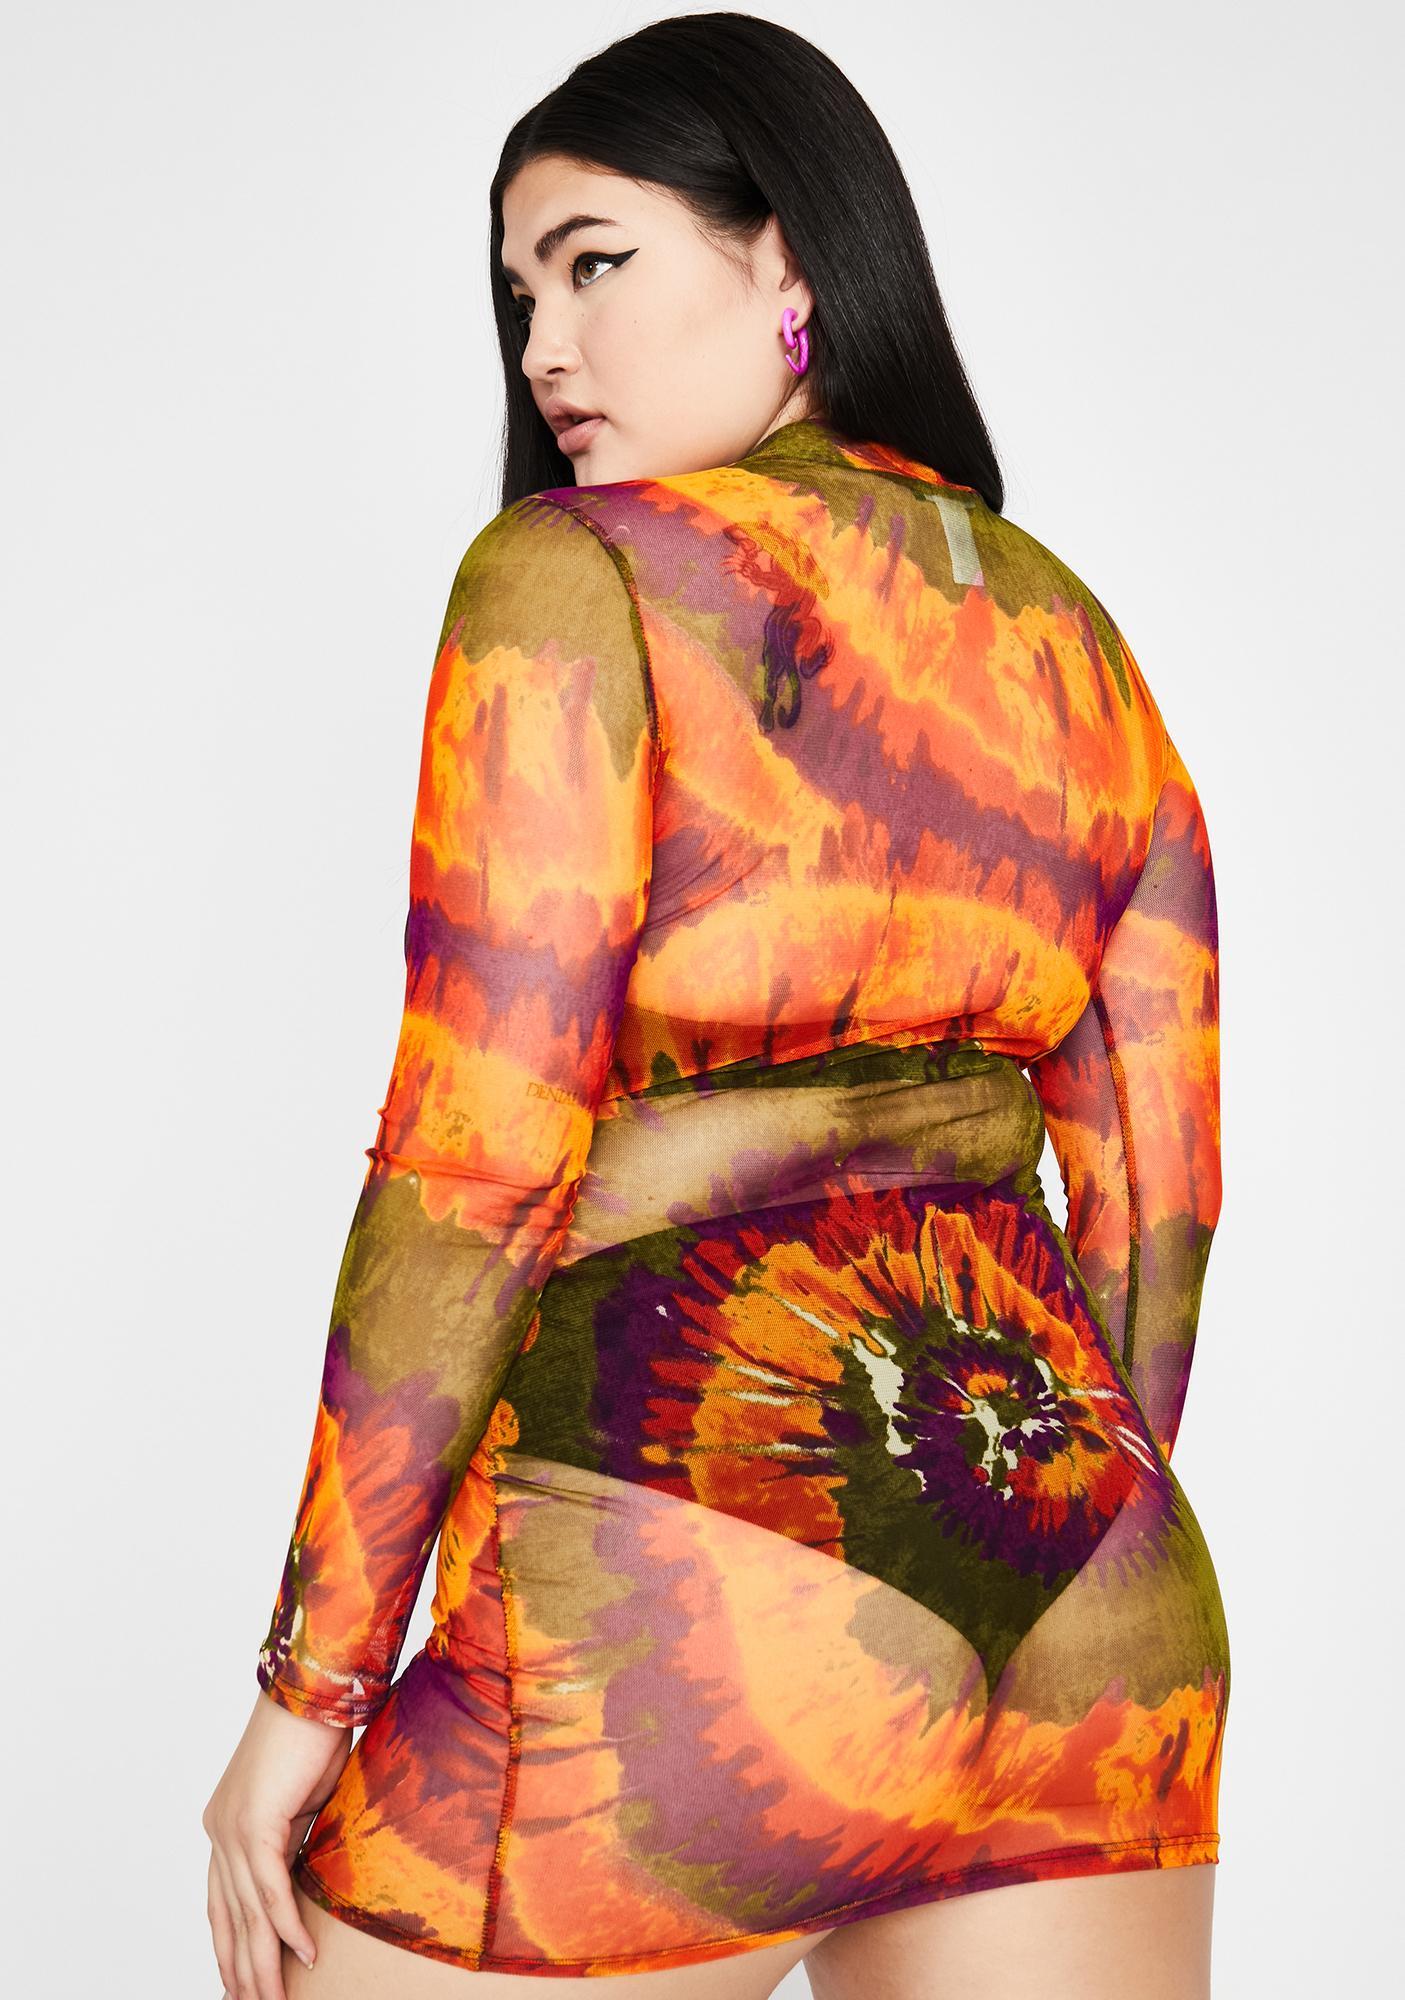 Amber True Smoke Signals Mesh Dress